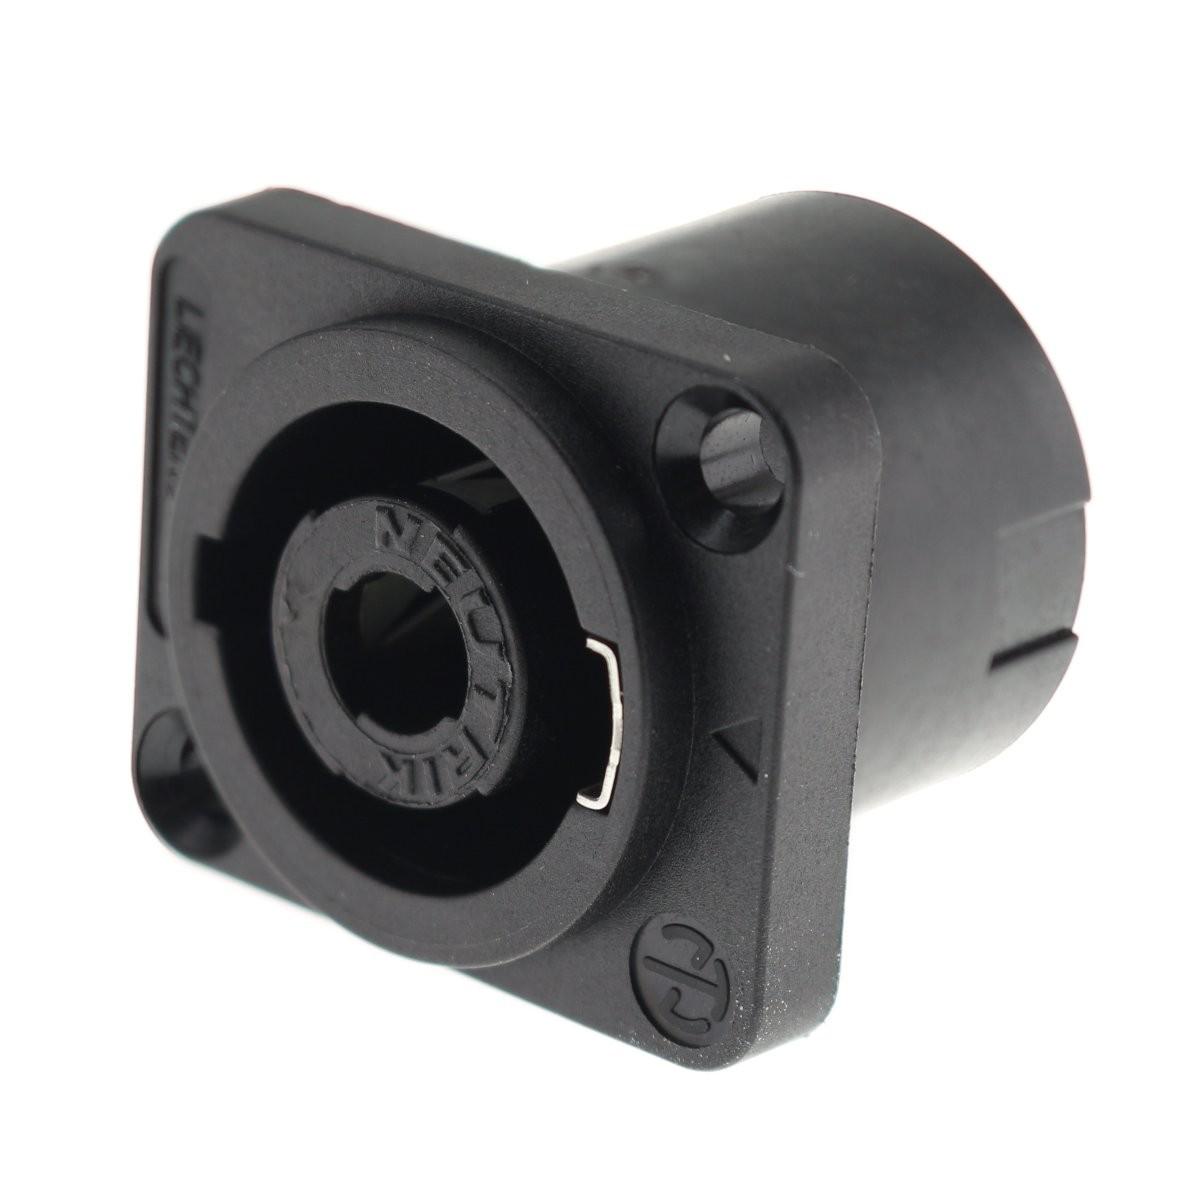 NEUTRIK NL4MP Male Speakon chassis socket